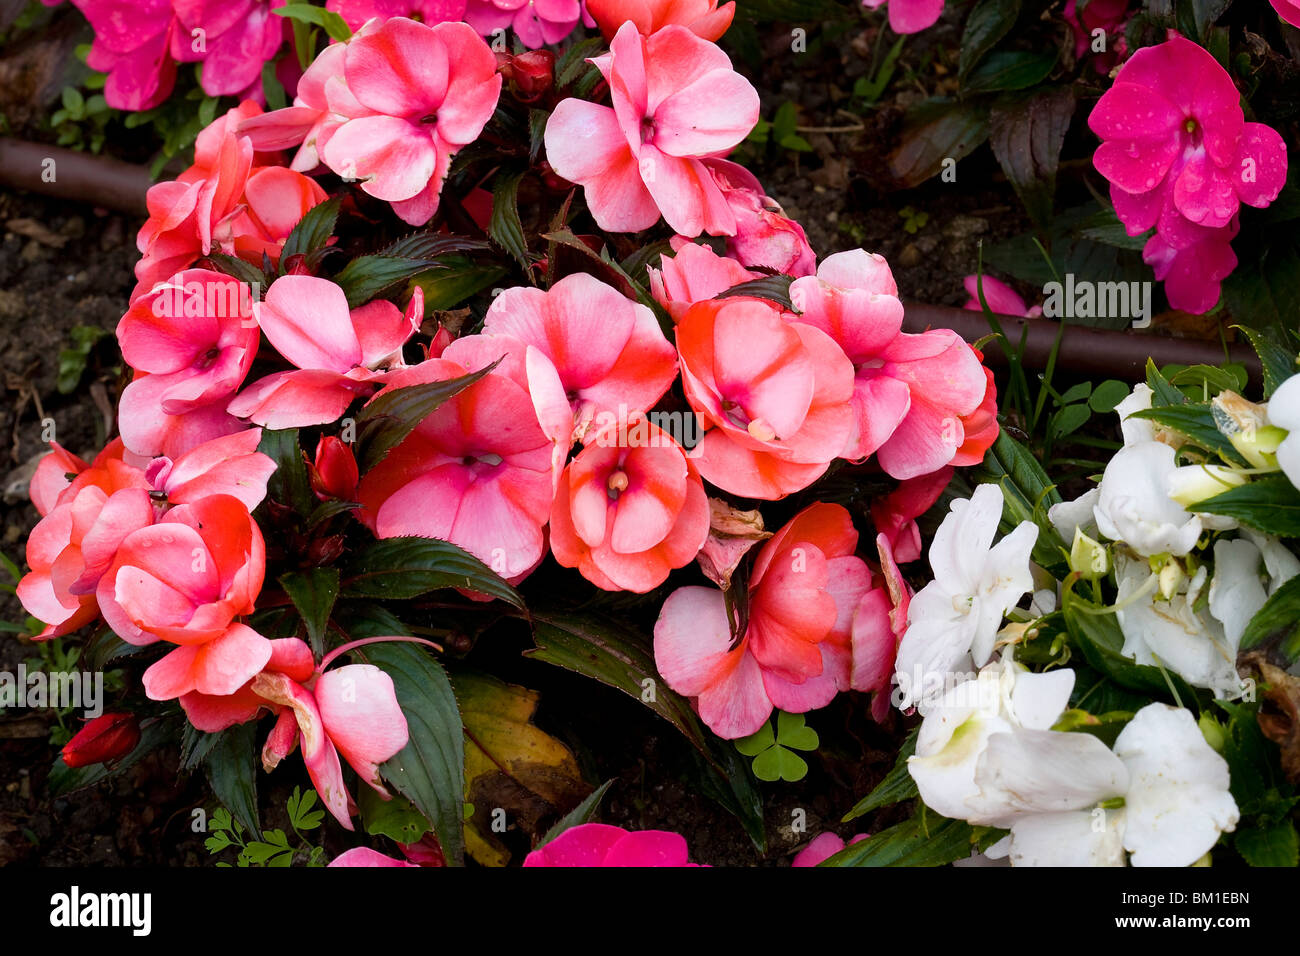 Fiori Di Vetro Nuova Guinea.Impatiens Flower Immagini Impatiens Flower Fotos Stock Alamy